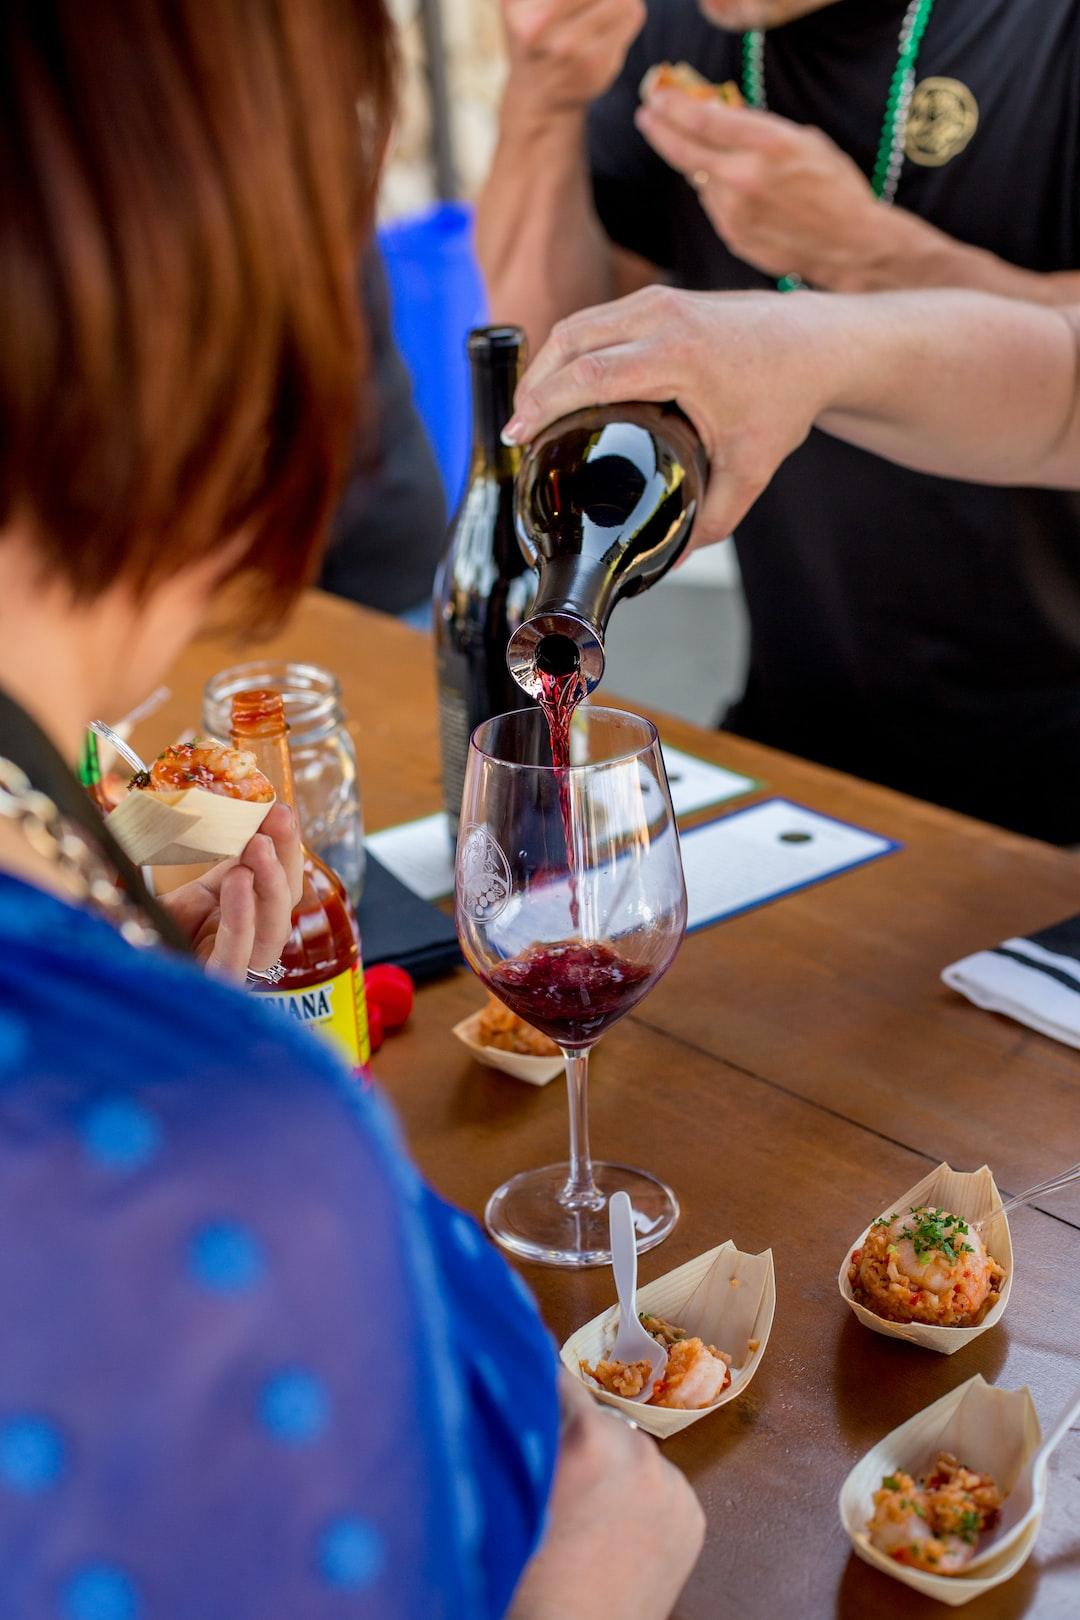 Seafood wine pairing